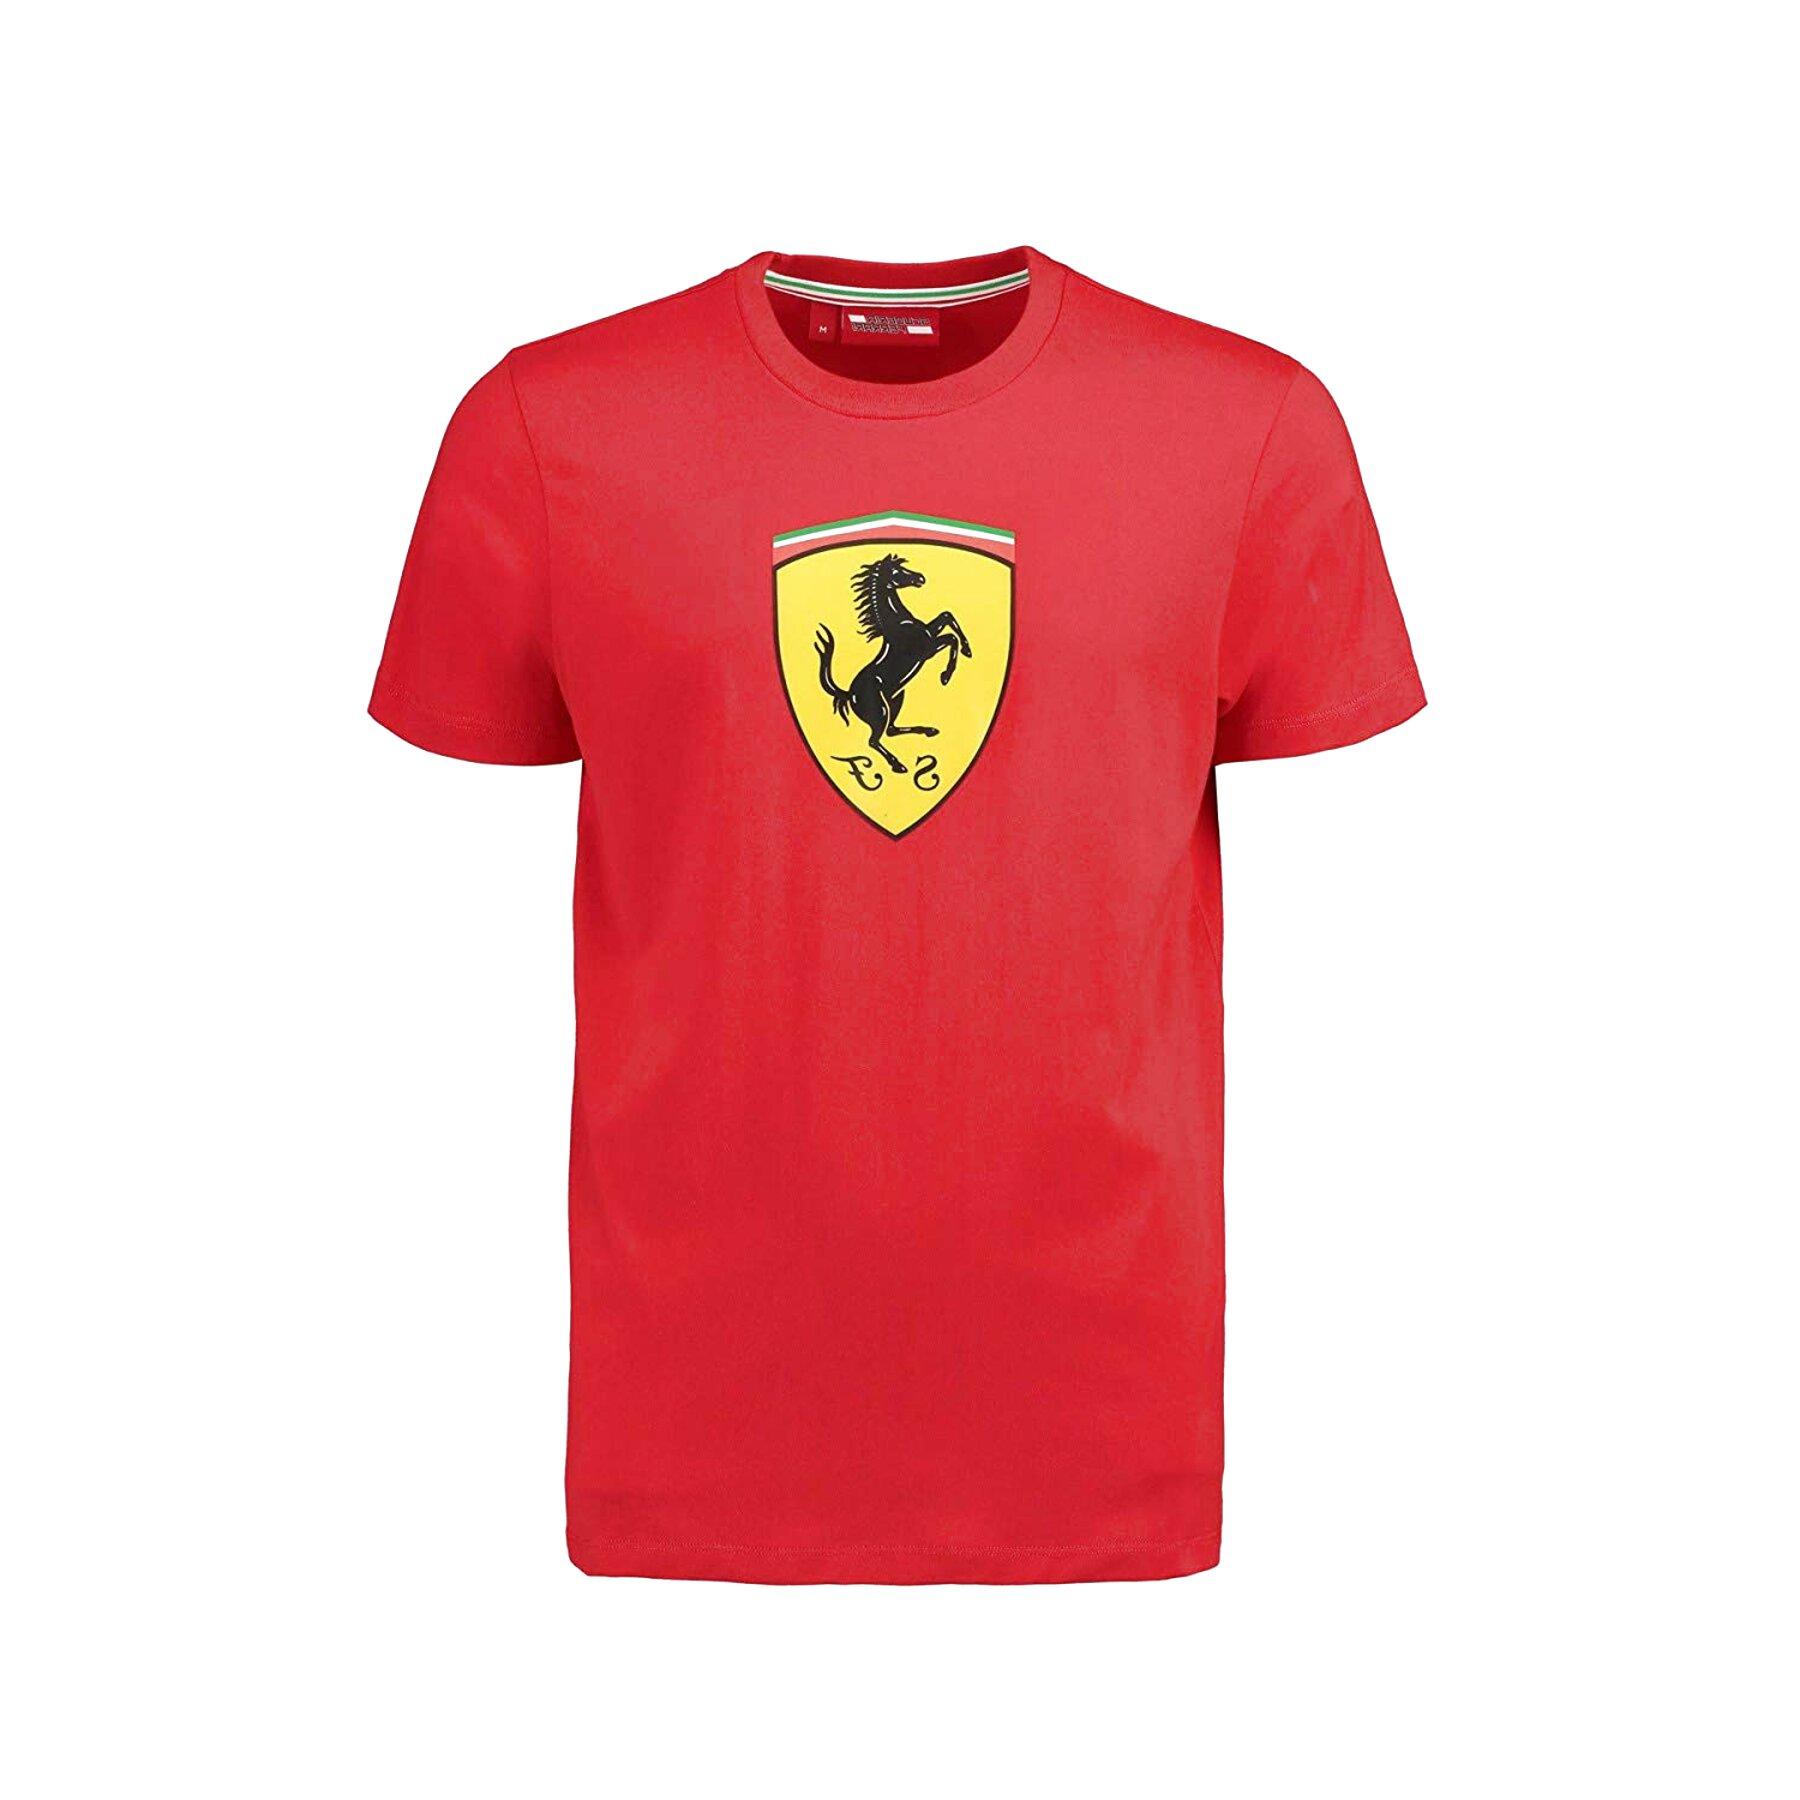 ferrari t shirt for sale